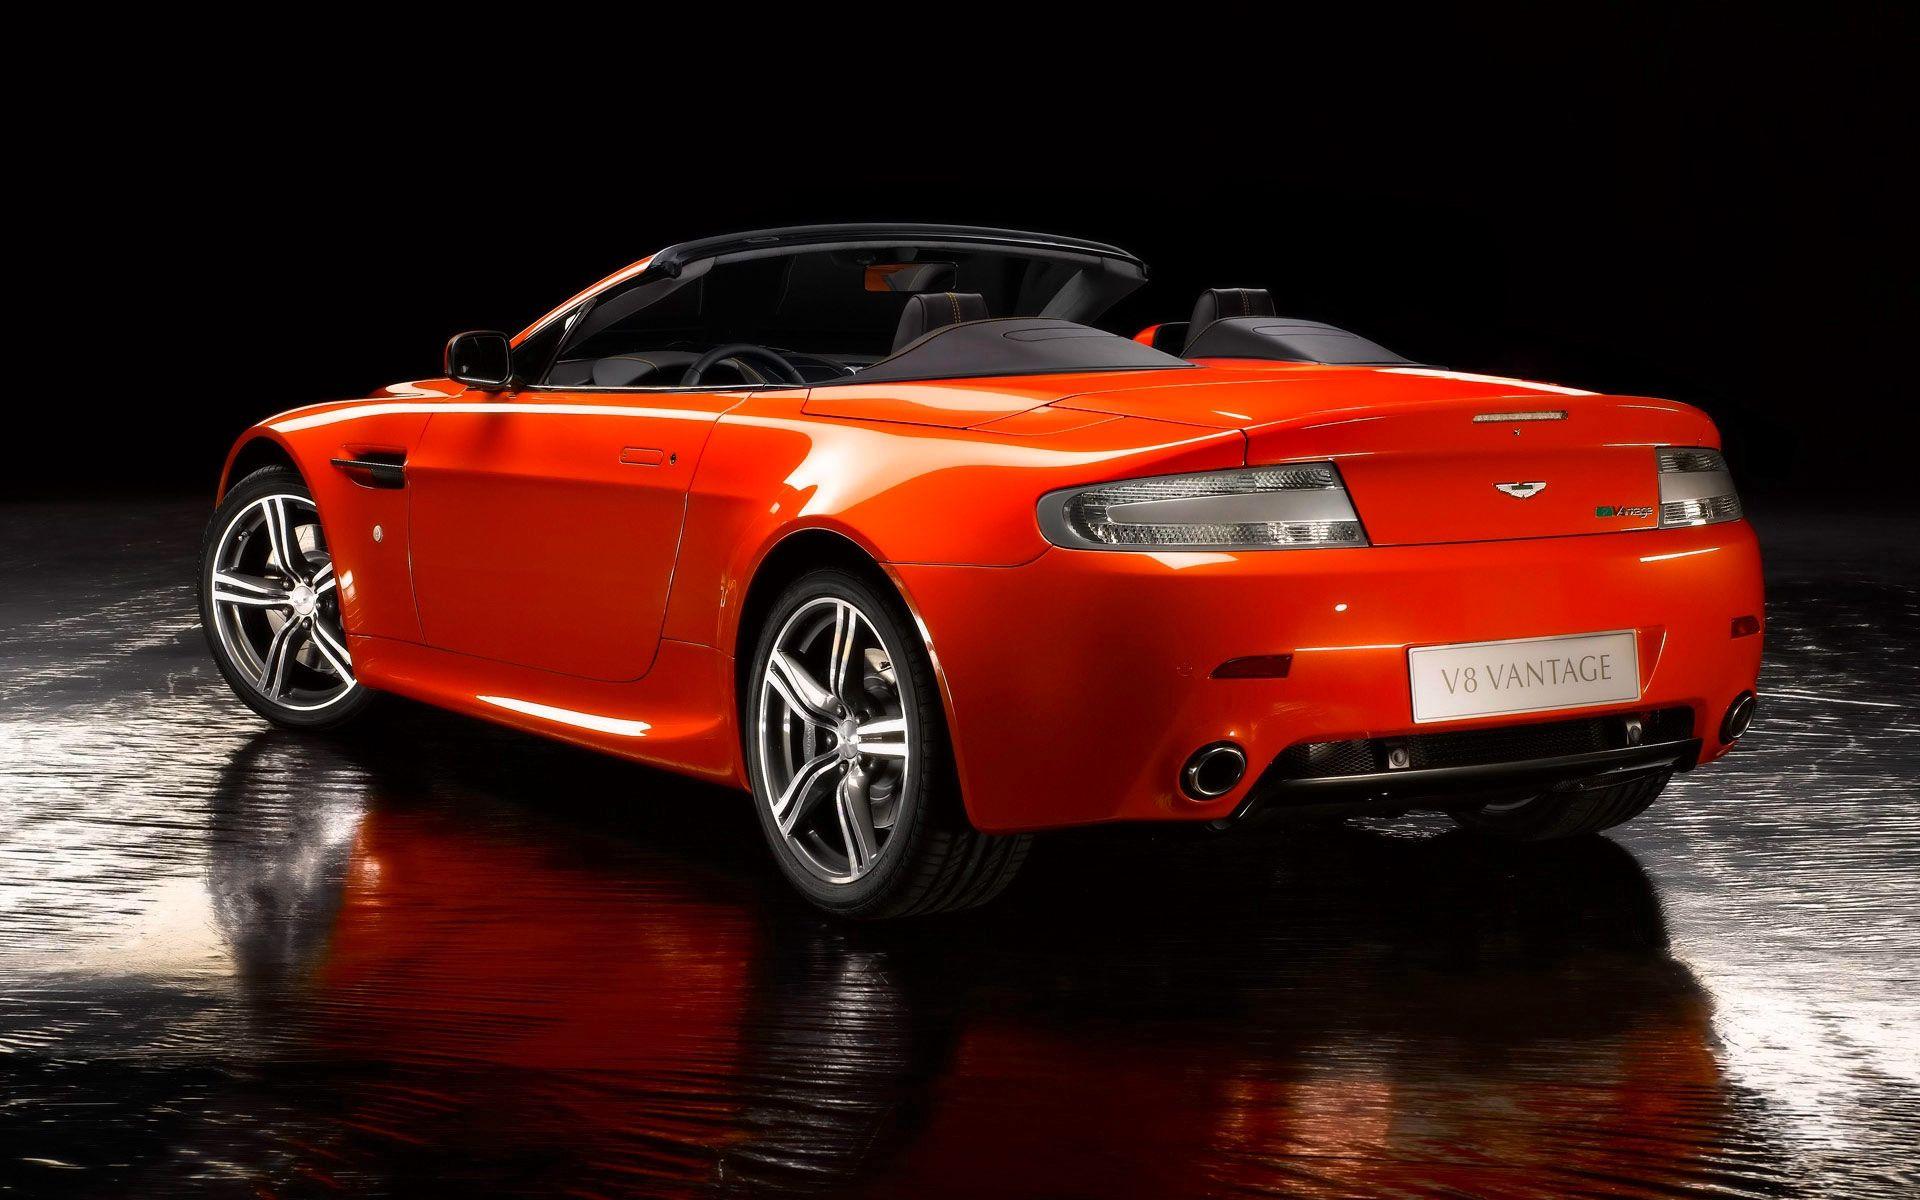 66264 Заставки и Обои Астон Мартин (Aston Martin) на телефон. Скачать Астон Мартин (Aston Martin), Тачки (Cars), V8, Vantage, Кабриолет, N400 картинки бесплатно